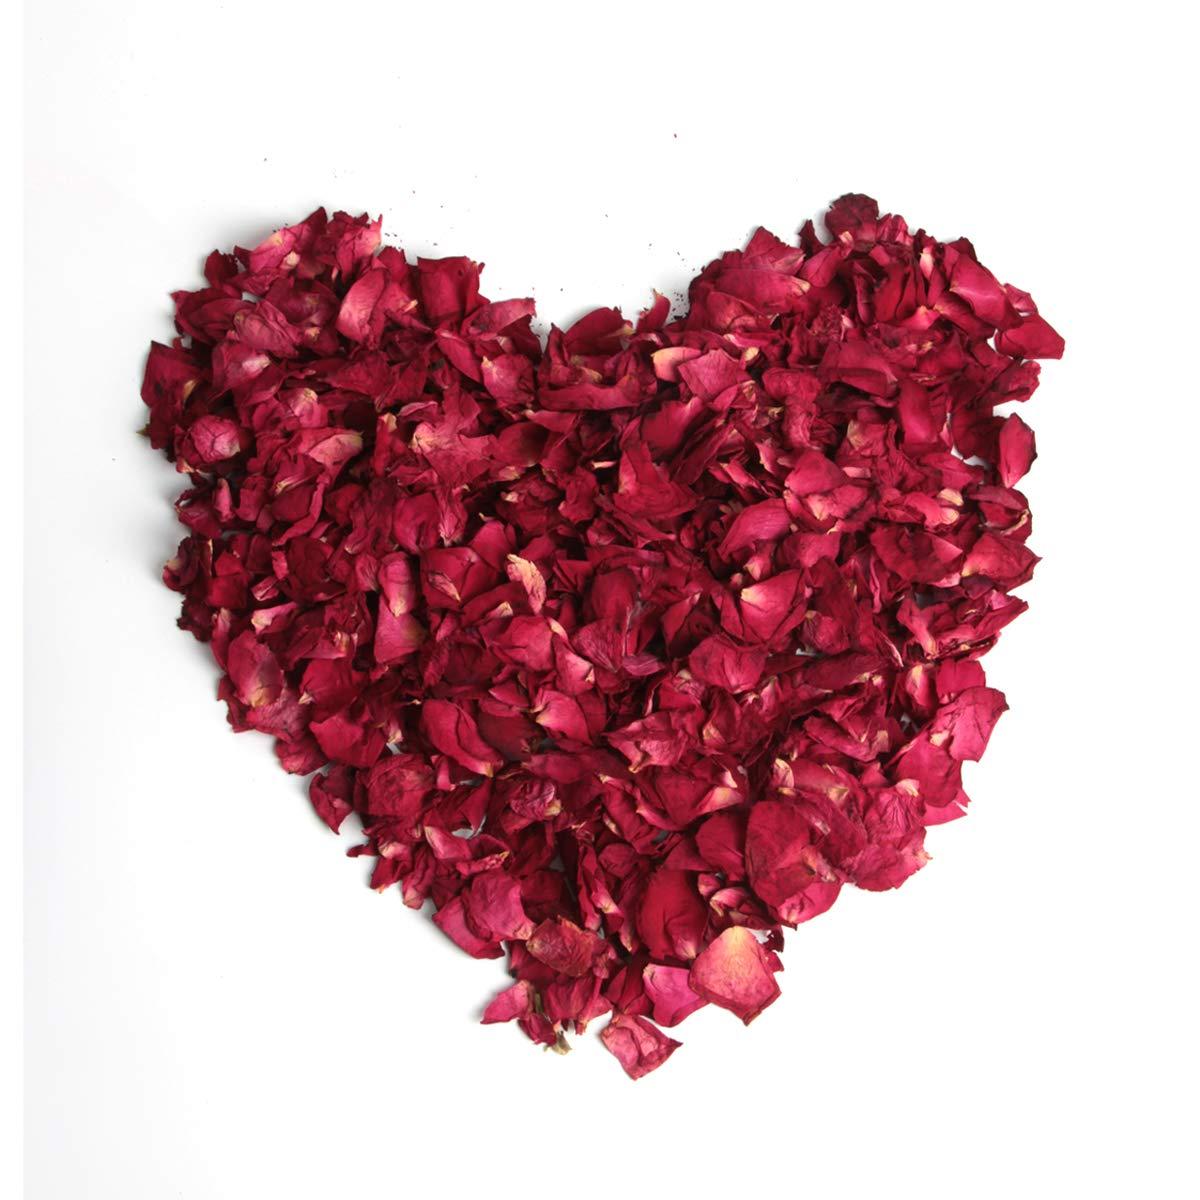 yalansmaiP 150 Grams Dried Rose Petals Red - Real Flower Rose Petal for Bath, Foot Bath, Sachets, Crafting, Wedding Confetti, DIY Accessories